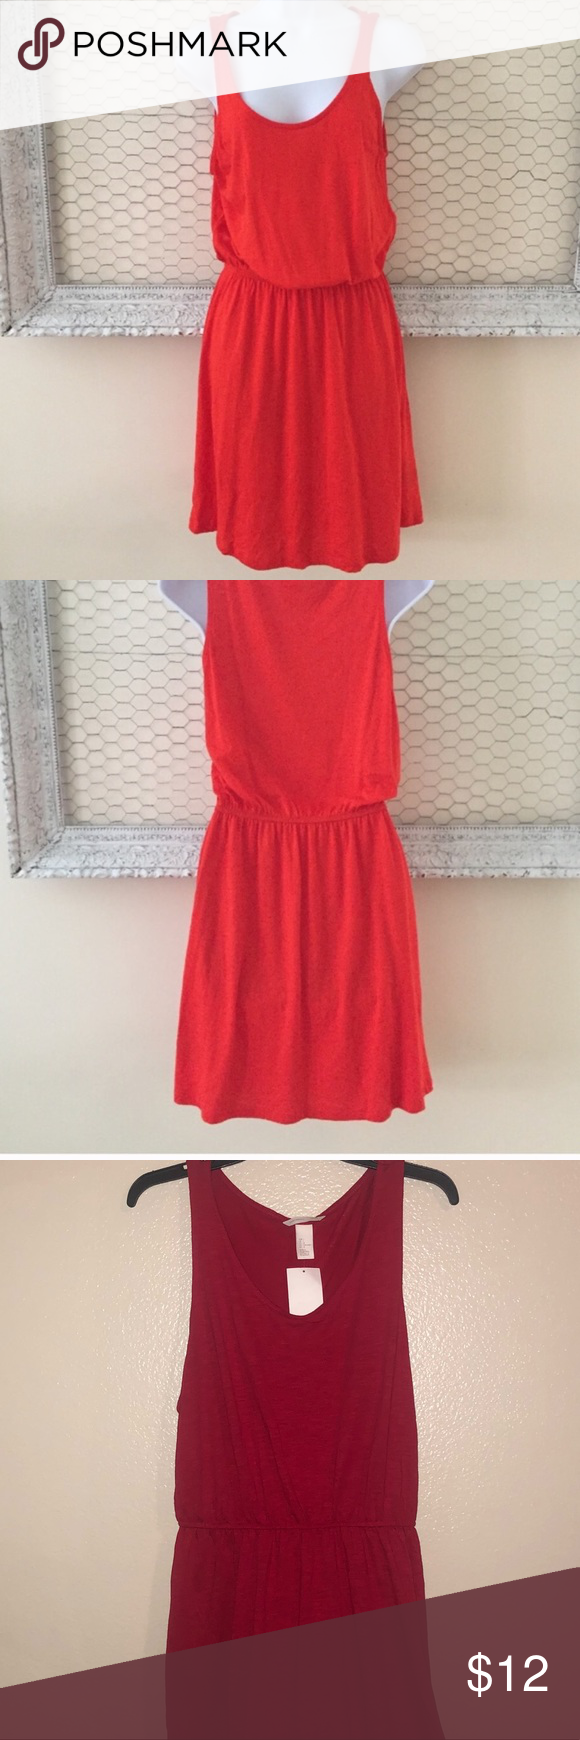 H M Red Basic Tank Top Dress Tank Top Dress Soft Dress Dresses [ 1740 x 580 Pixel ]